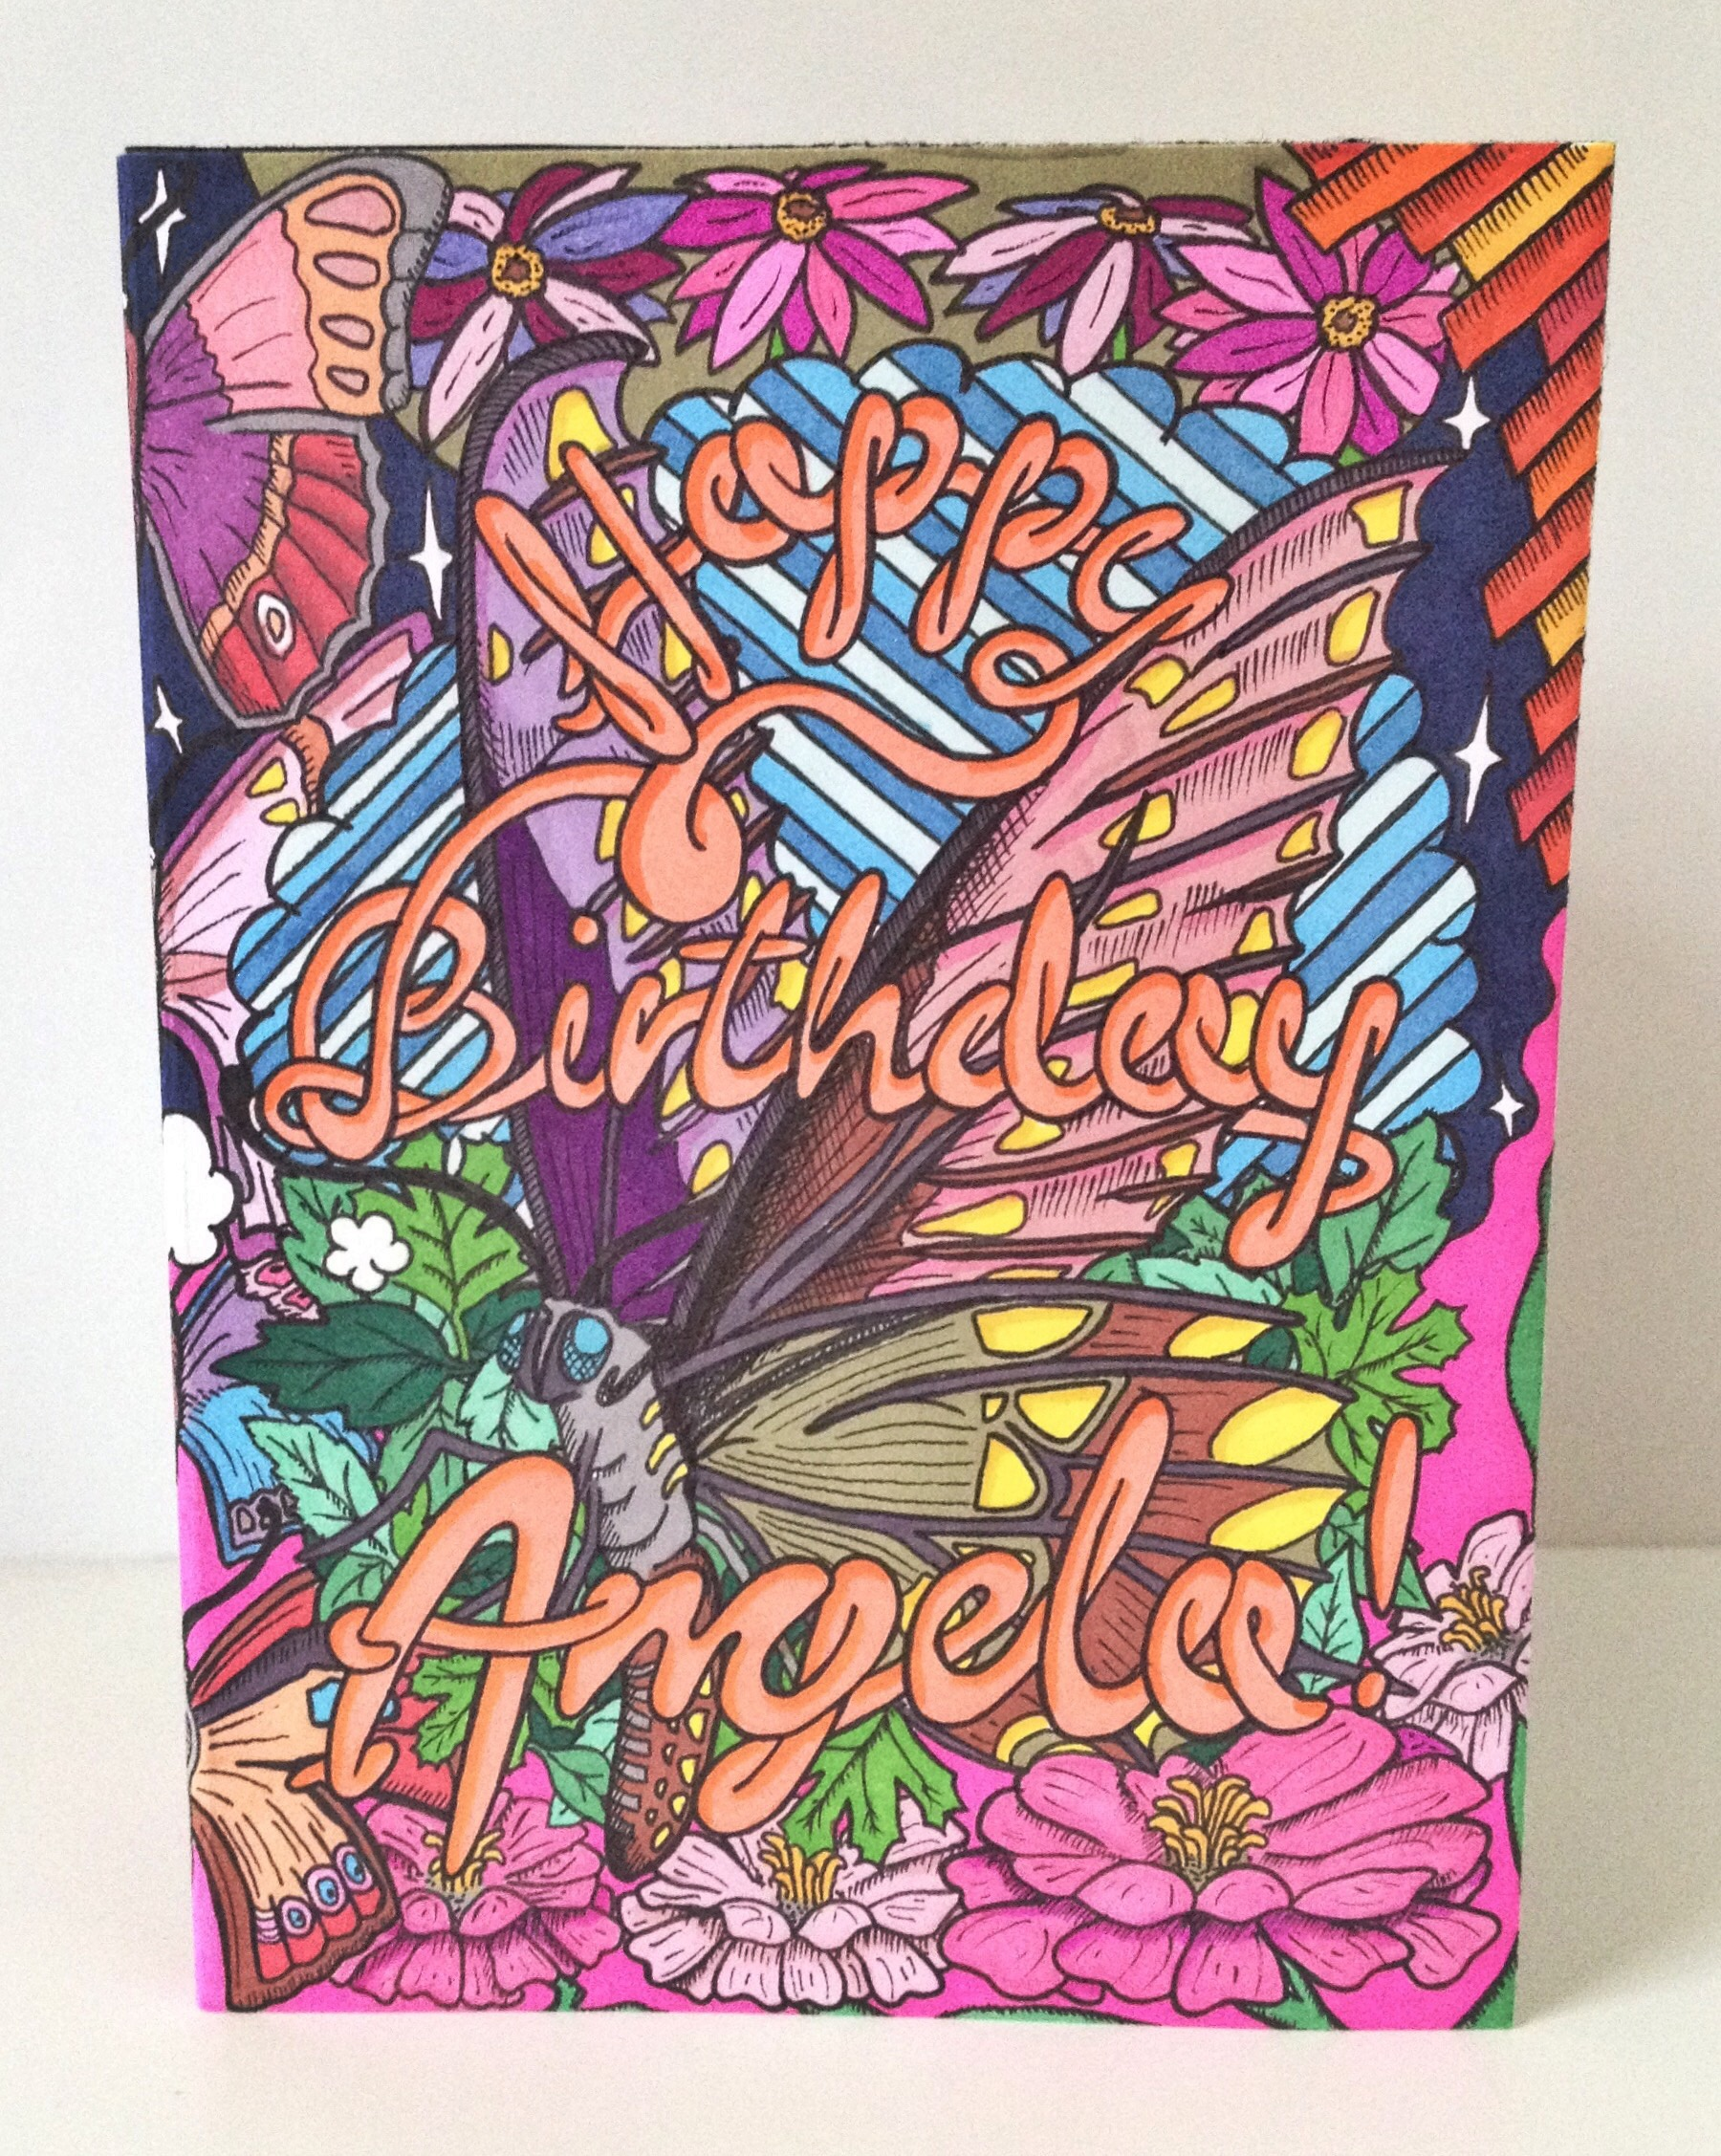 Angela's birthday card (1 of 3)